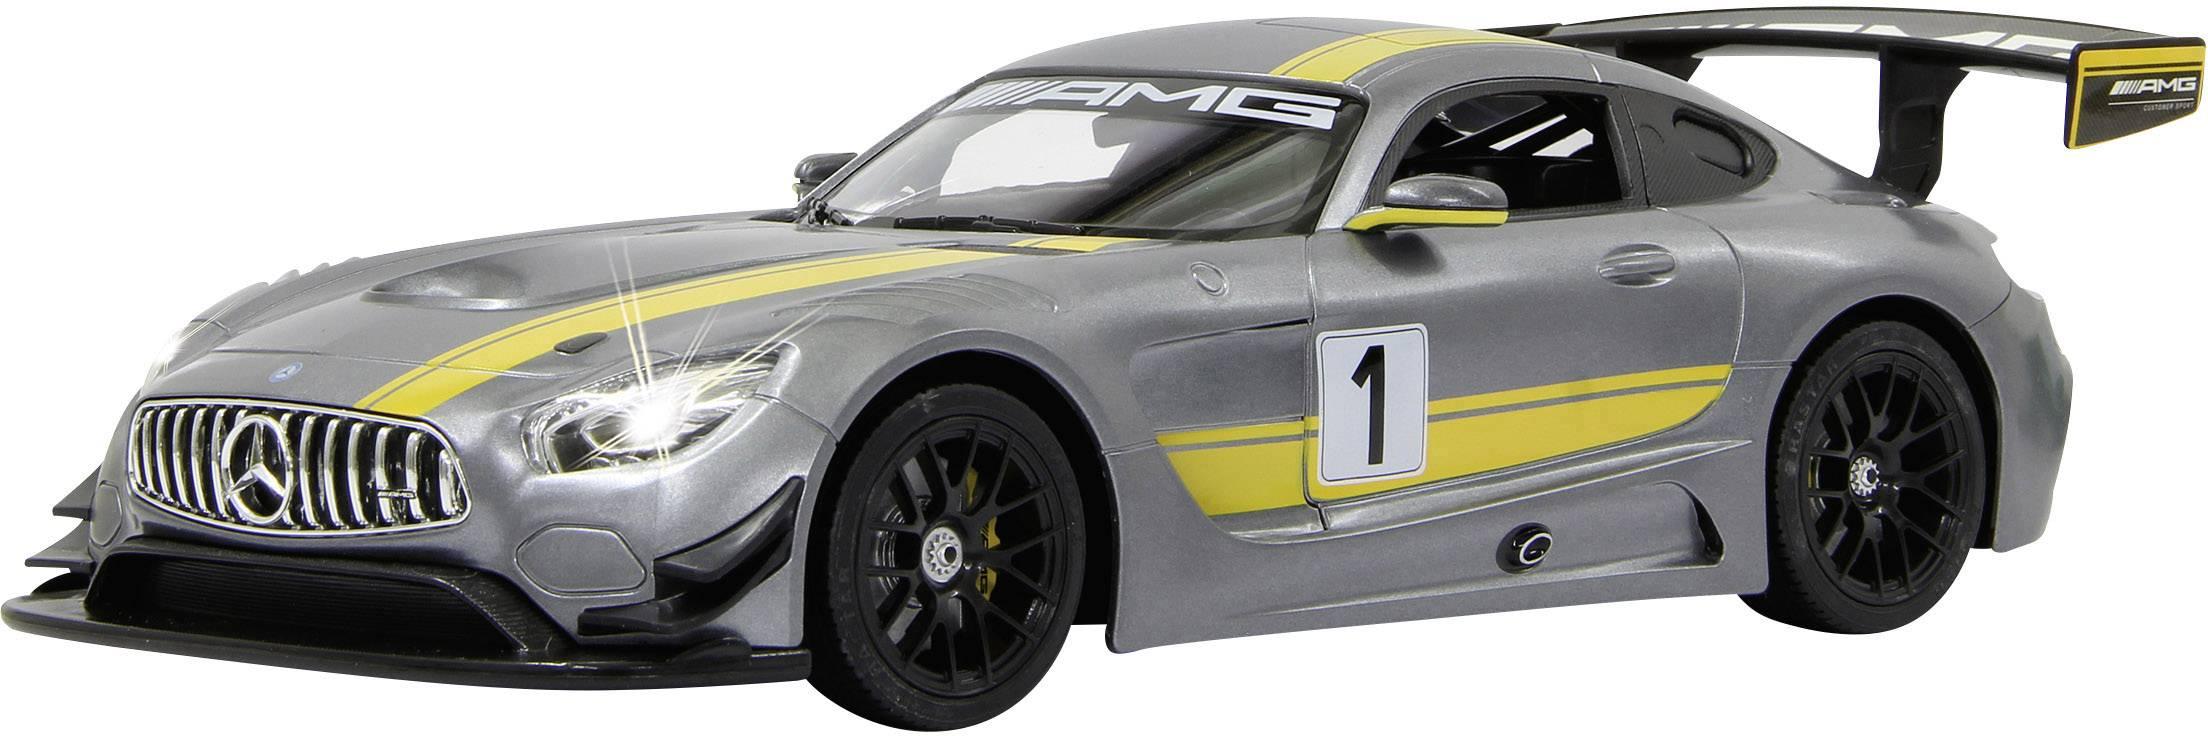 RC model auta Jamara 405072 – Mercedes AMG GT3 Performance, šedá, silniční vůz